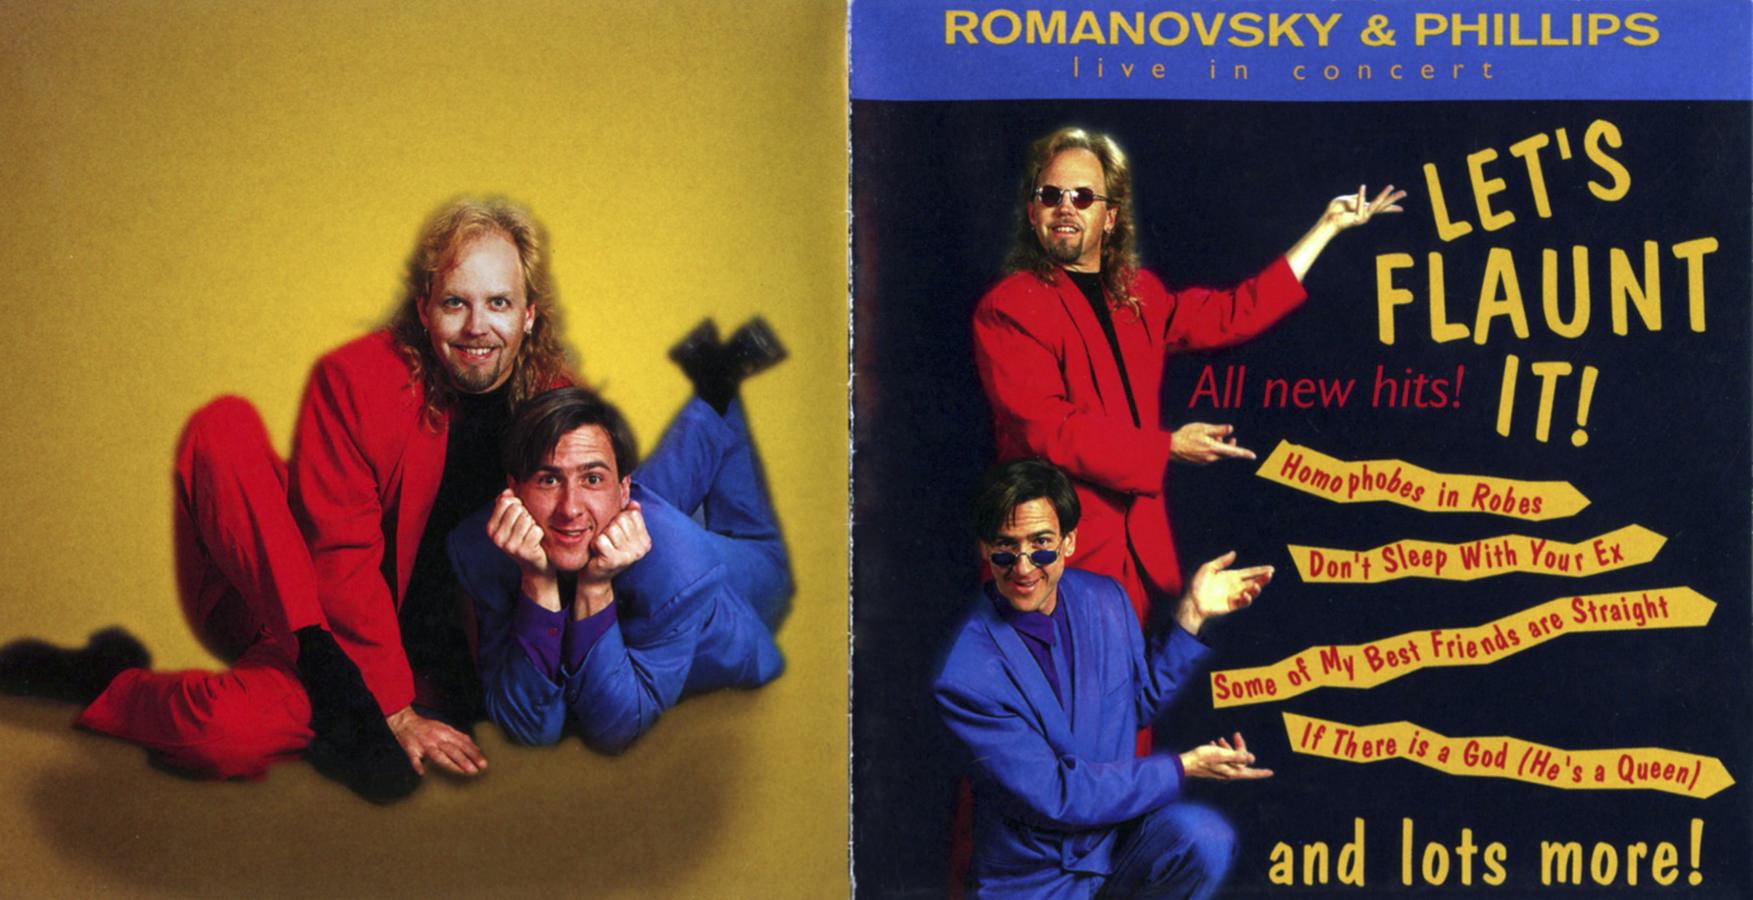 Romanovsky & Phillips, Let's Flaunt It